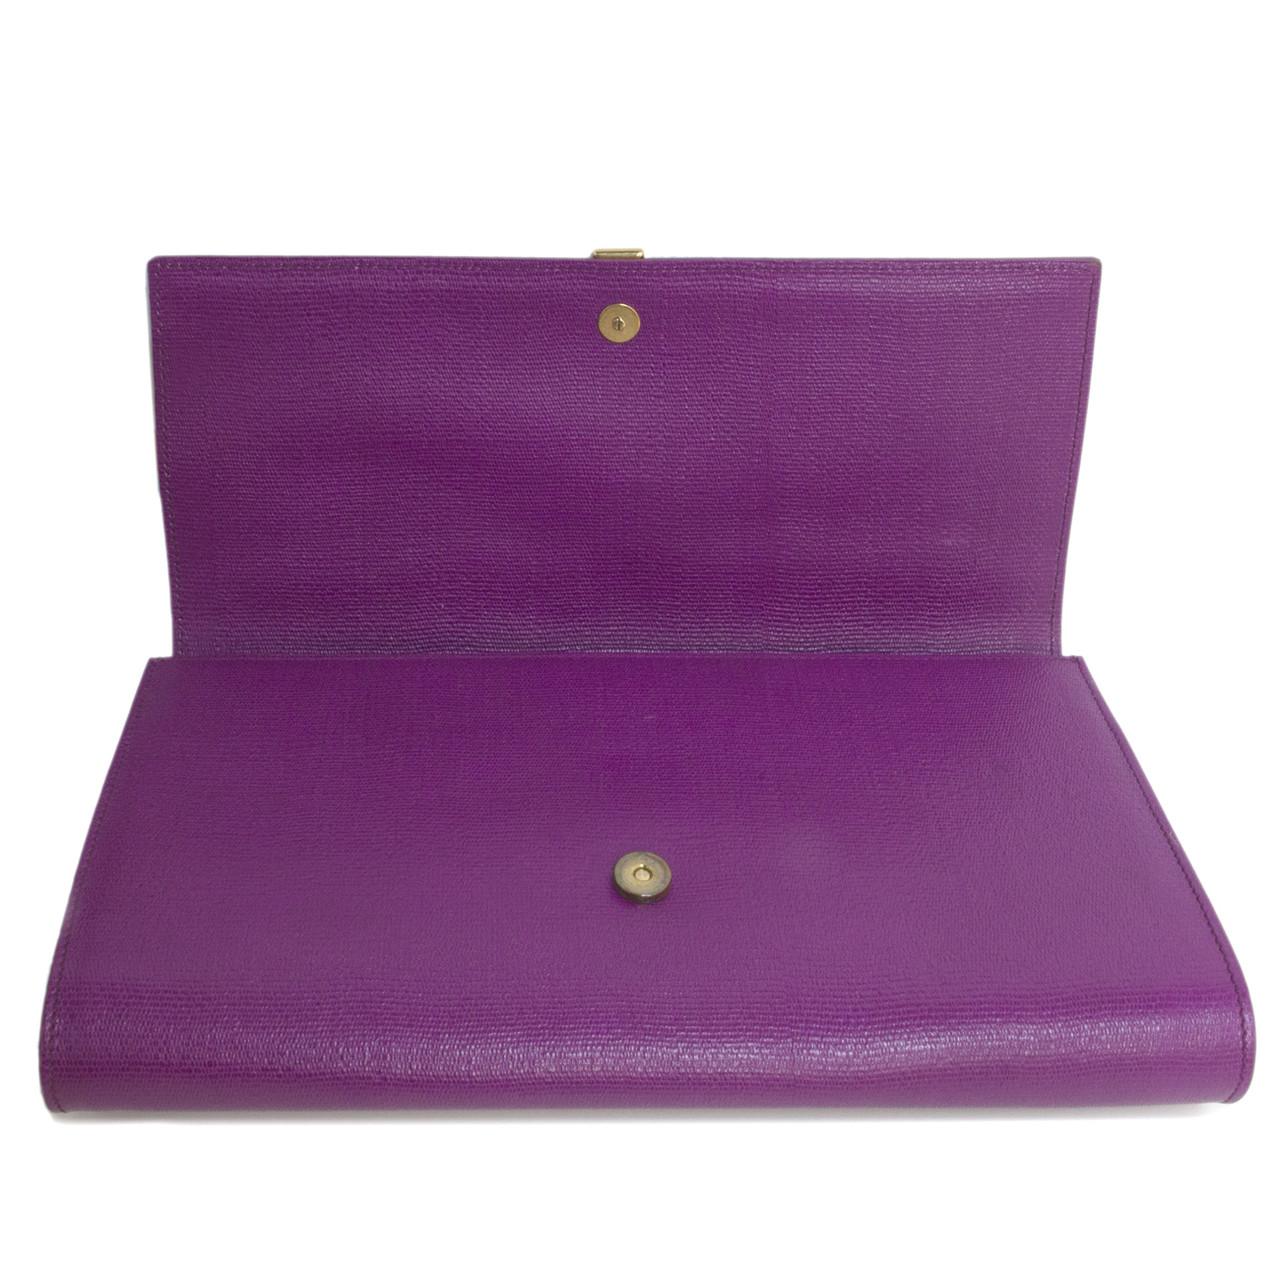 e7151dc1c3baf YSL Saint Laurent Purple Textured Calfskin Classic Y Clutch - modaselle